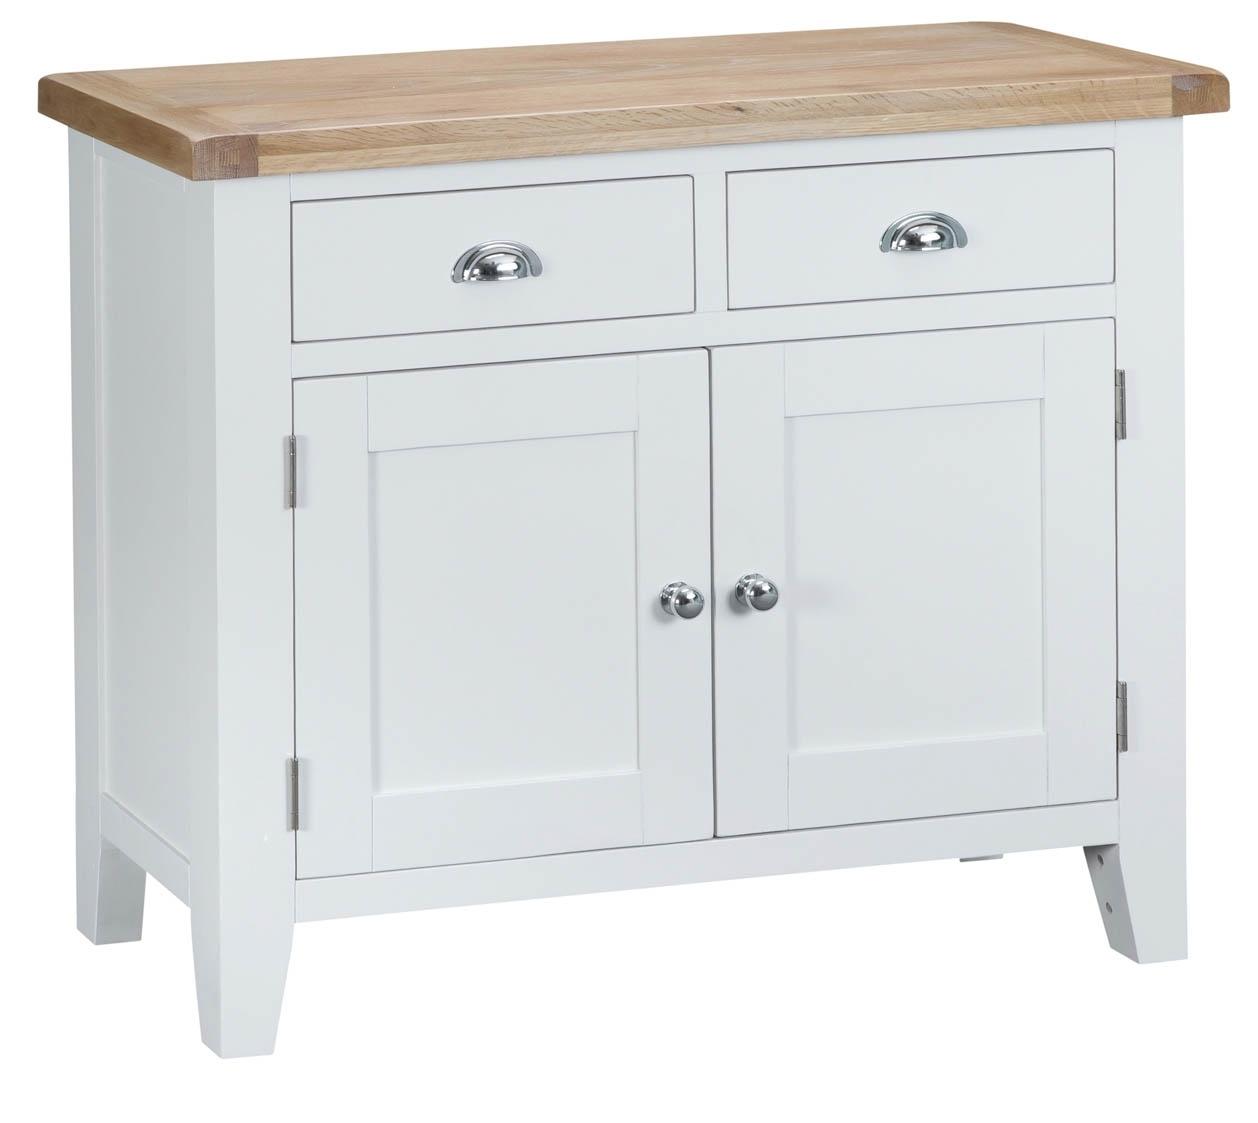 Woodbridge 2 Door White Sideboard | Fully Assembled | Oak World with regard to 3-Drawer/2-Door White Wash Sideboards (Image 30 of 30)